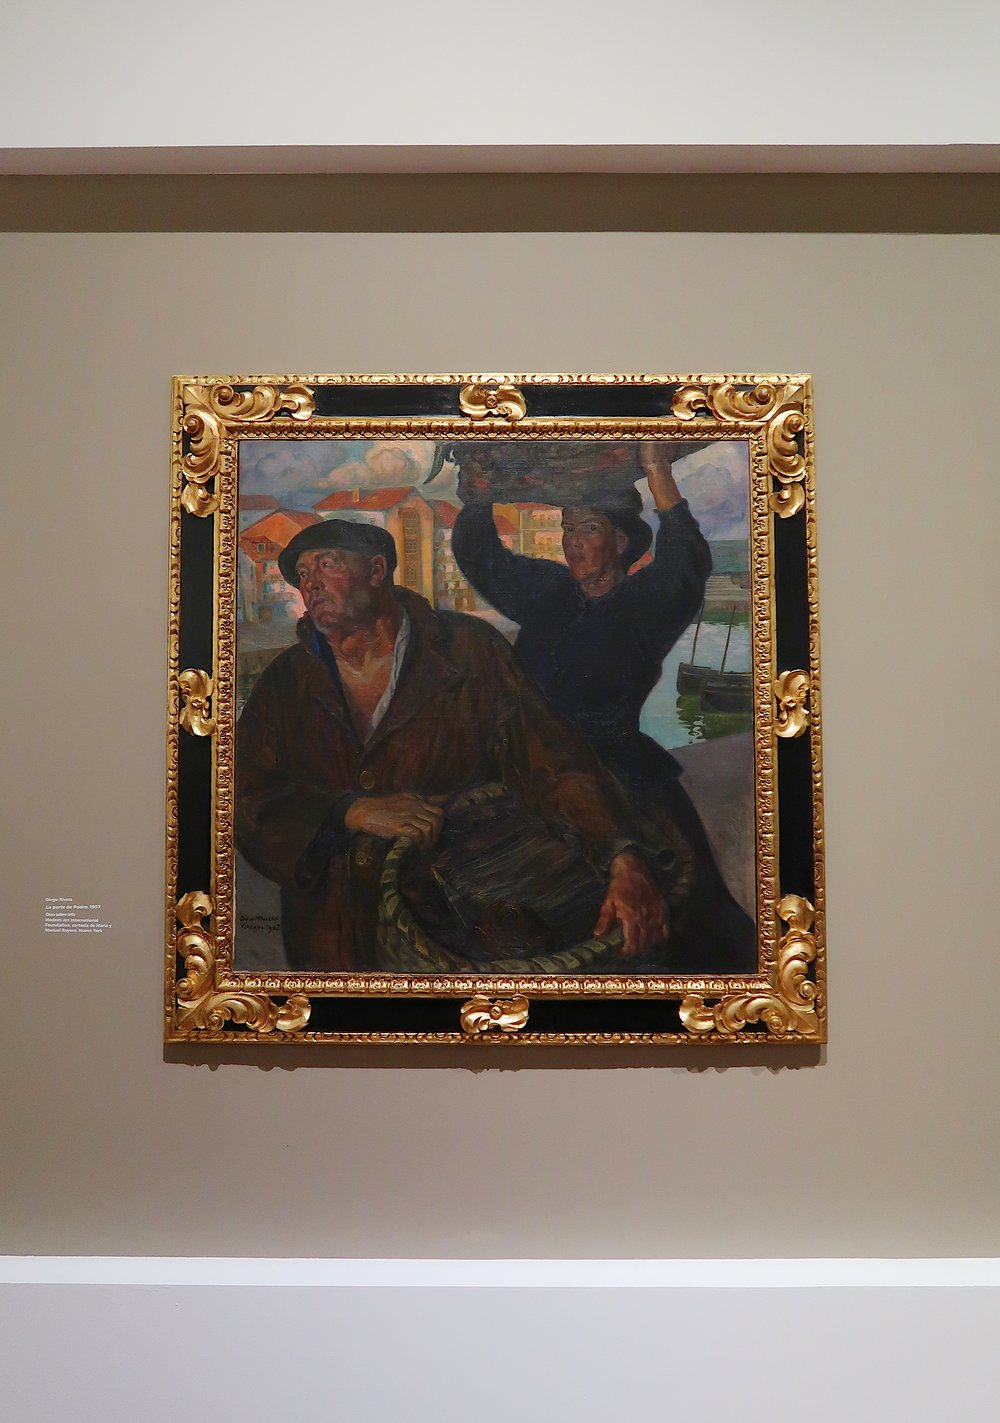 Diego Rivera <3